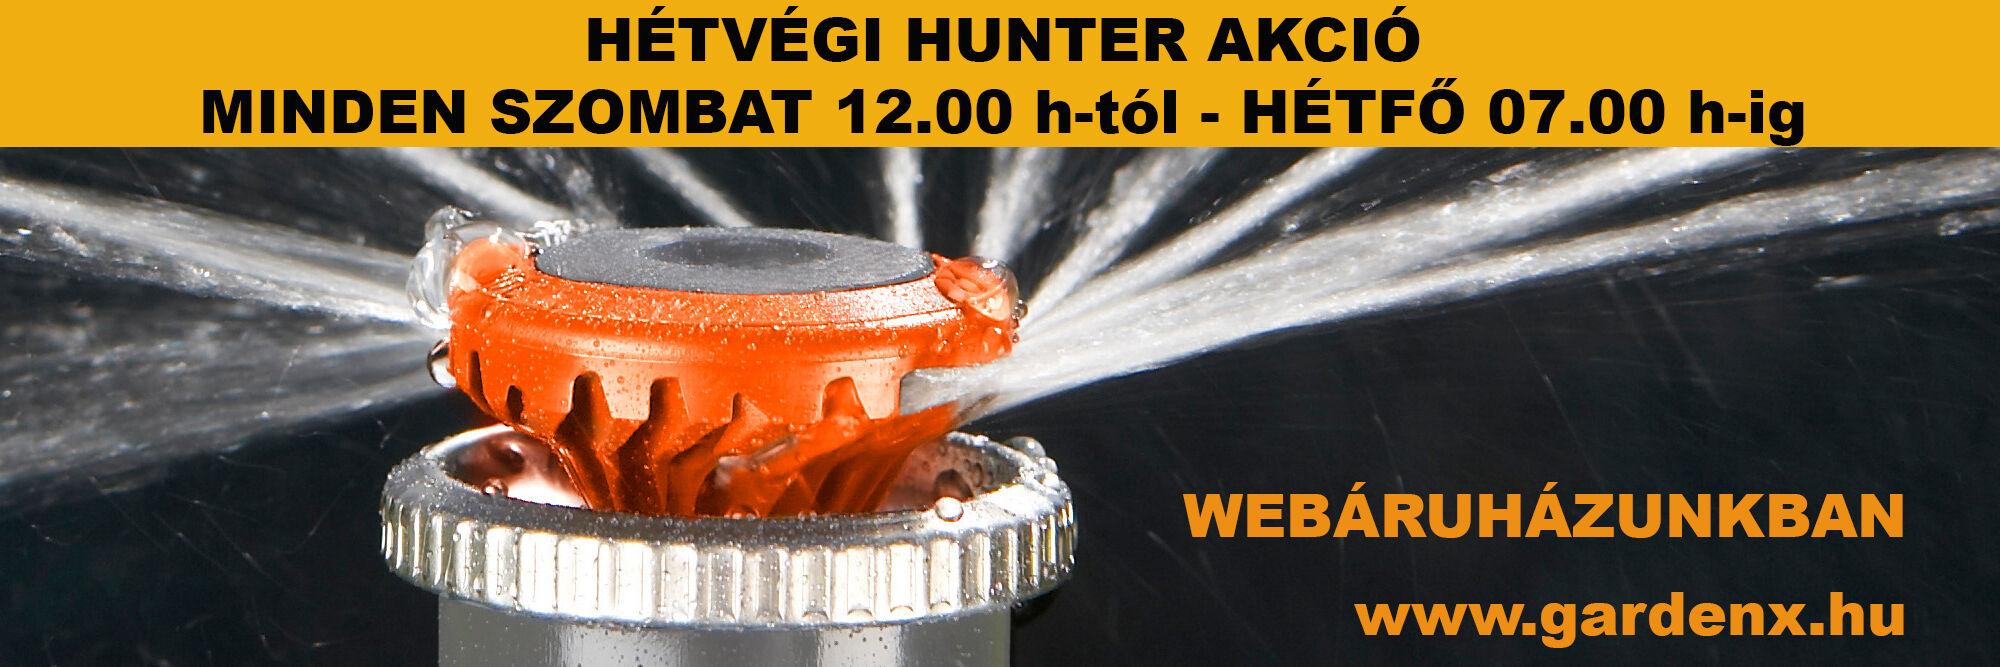 Hunter hétvégi akció